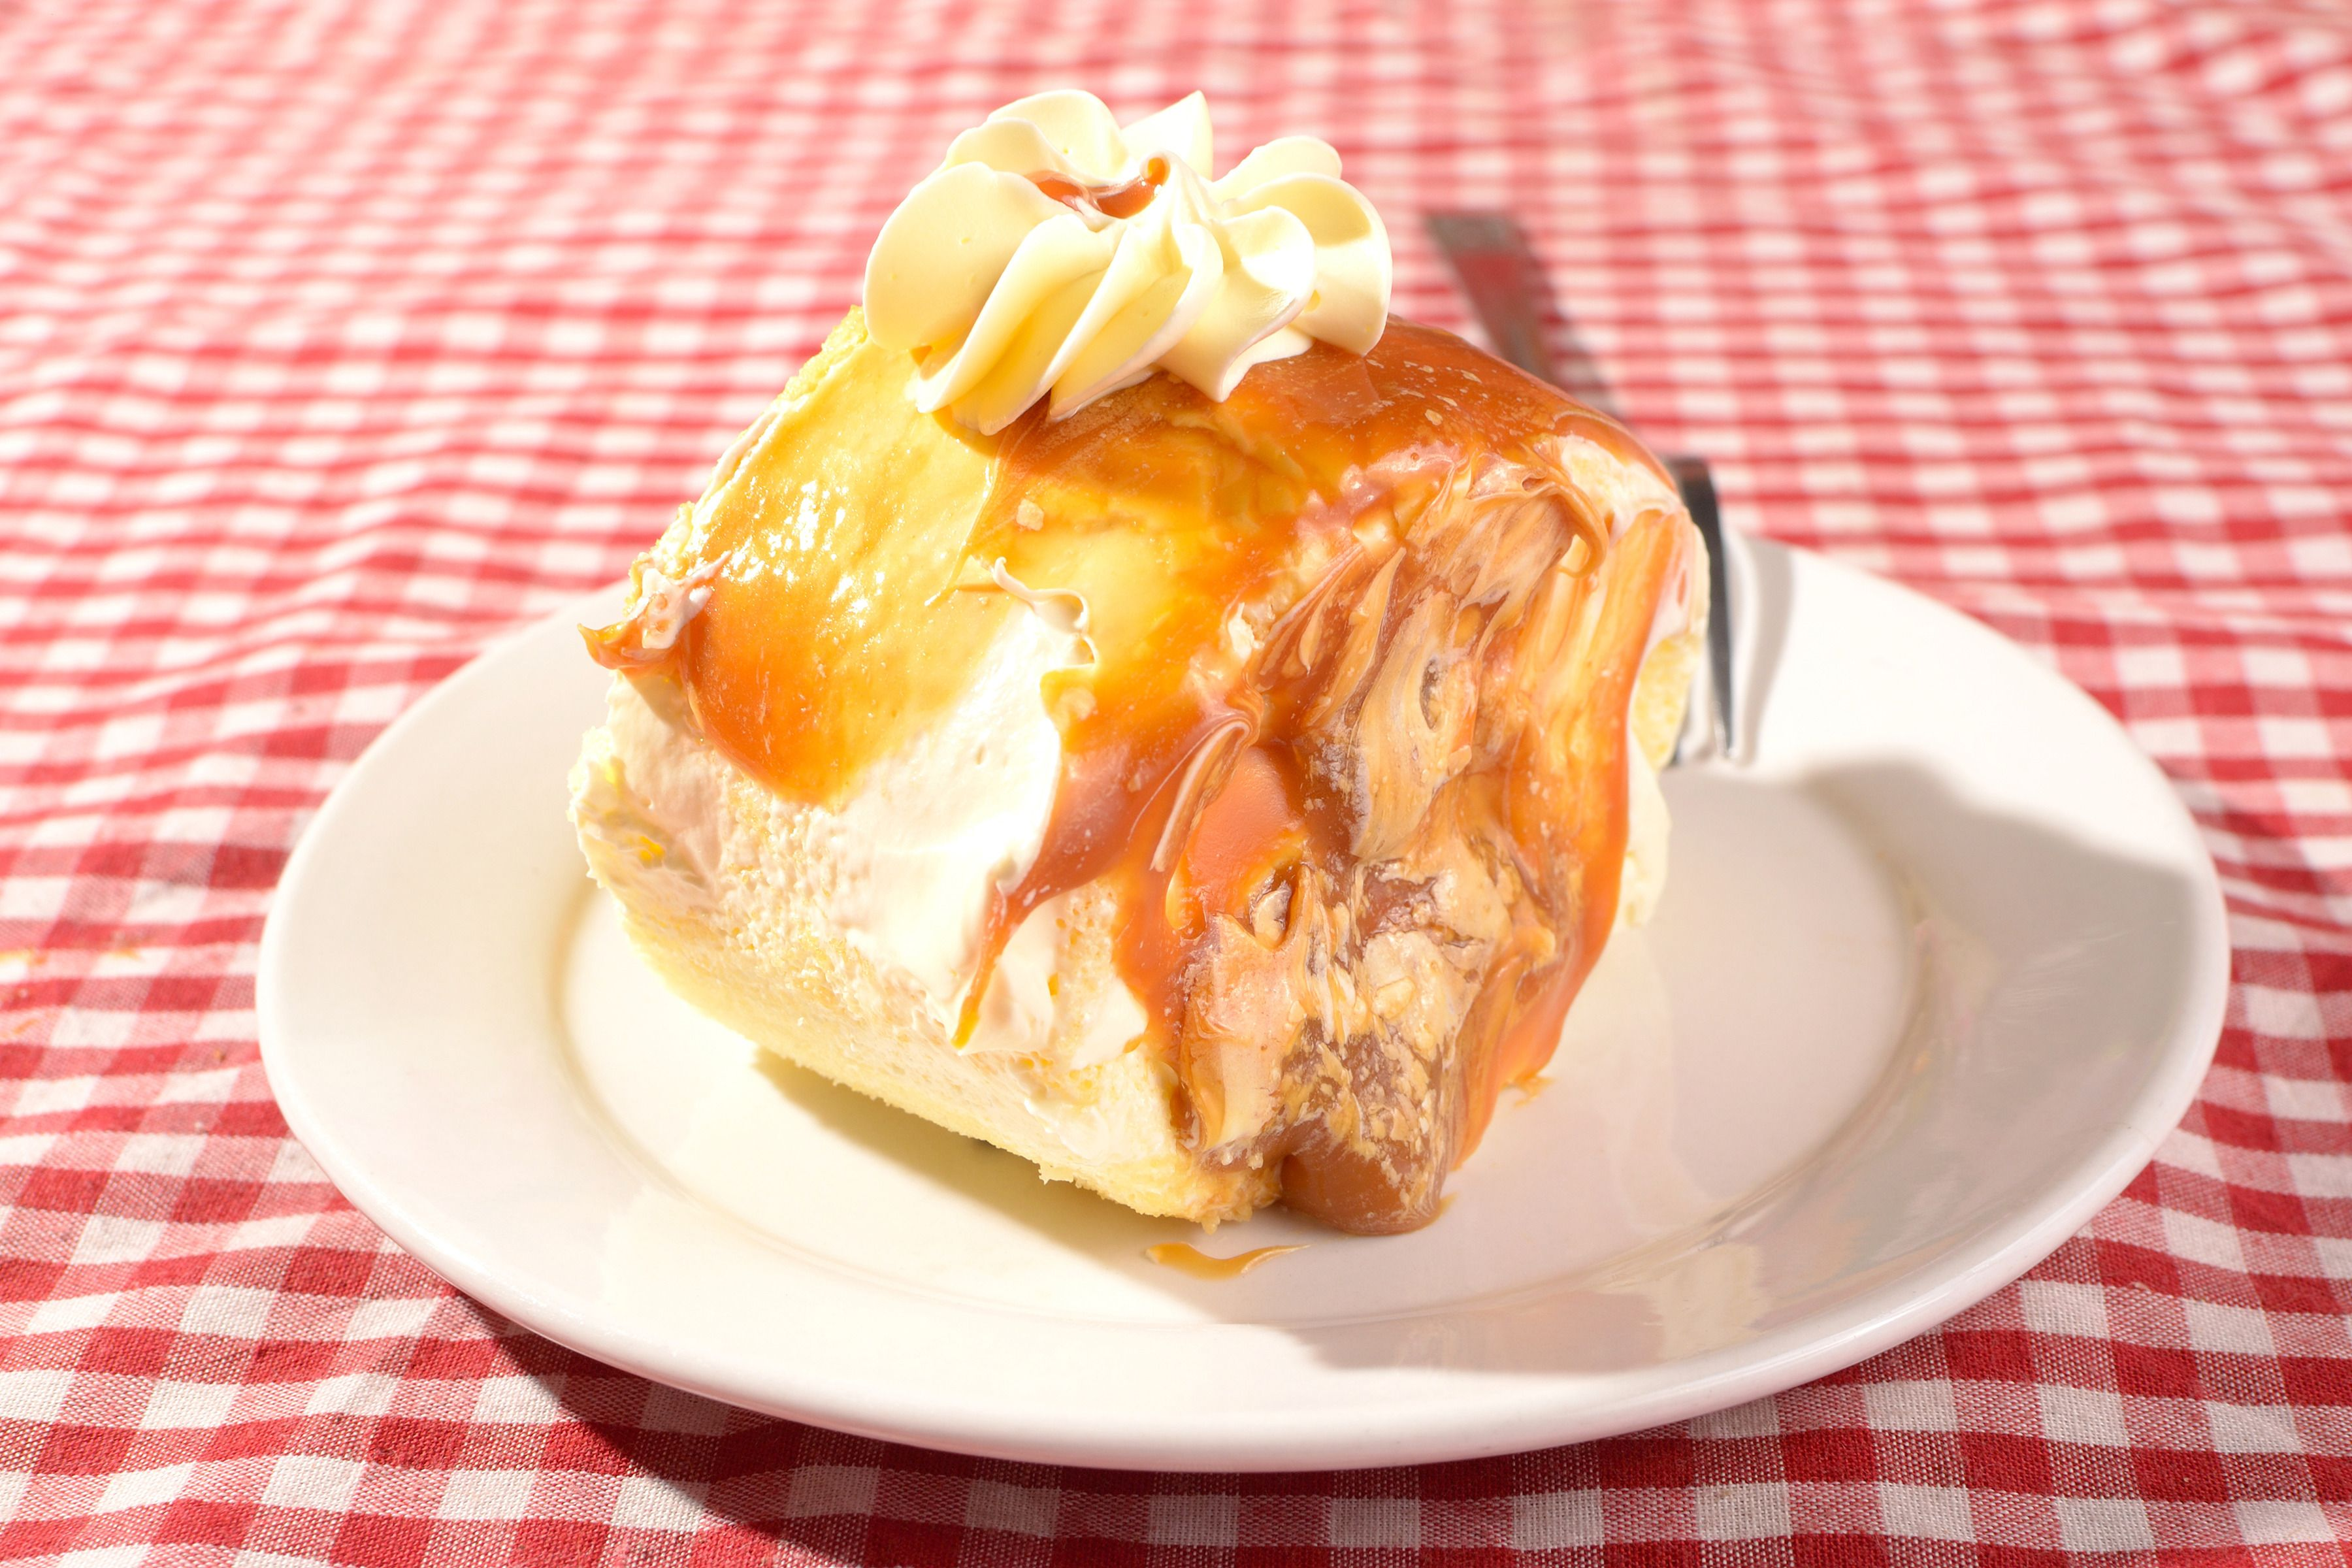 How to make seville orange crunch cake crunch cake